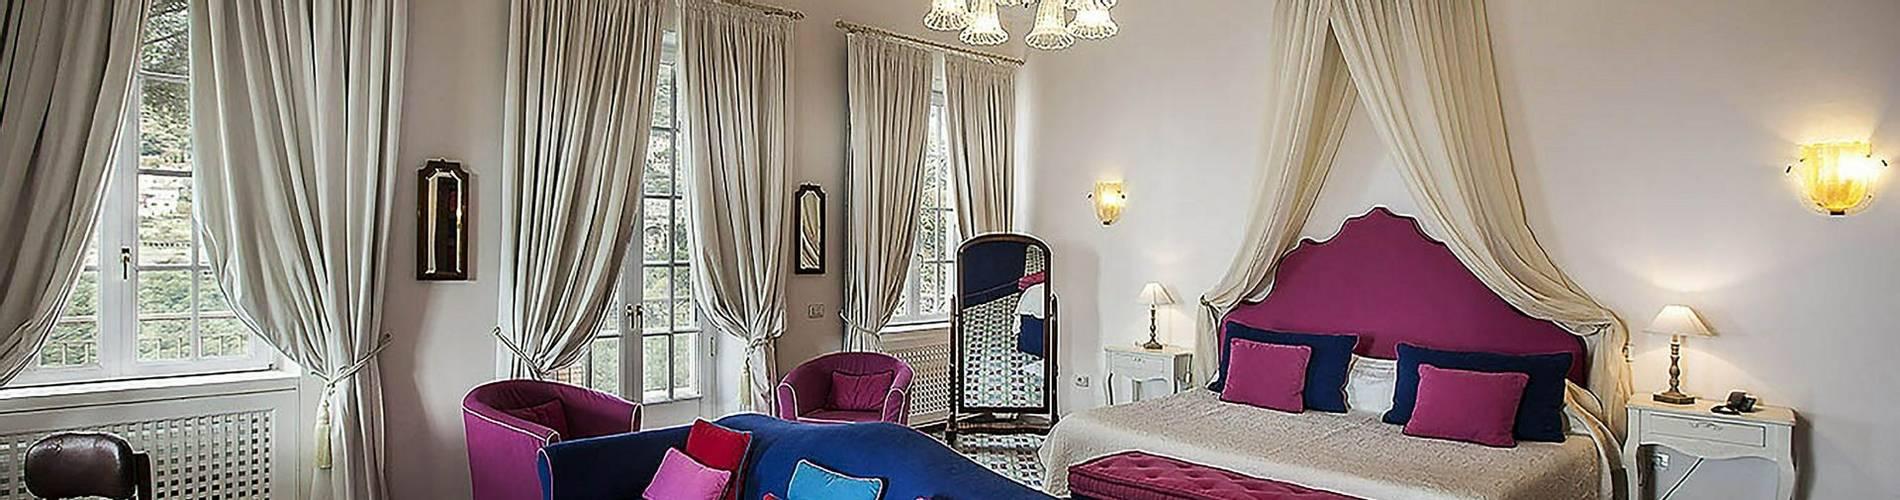 Villa Maria, Amalfi Coast, Italy, junior-suite.jpg